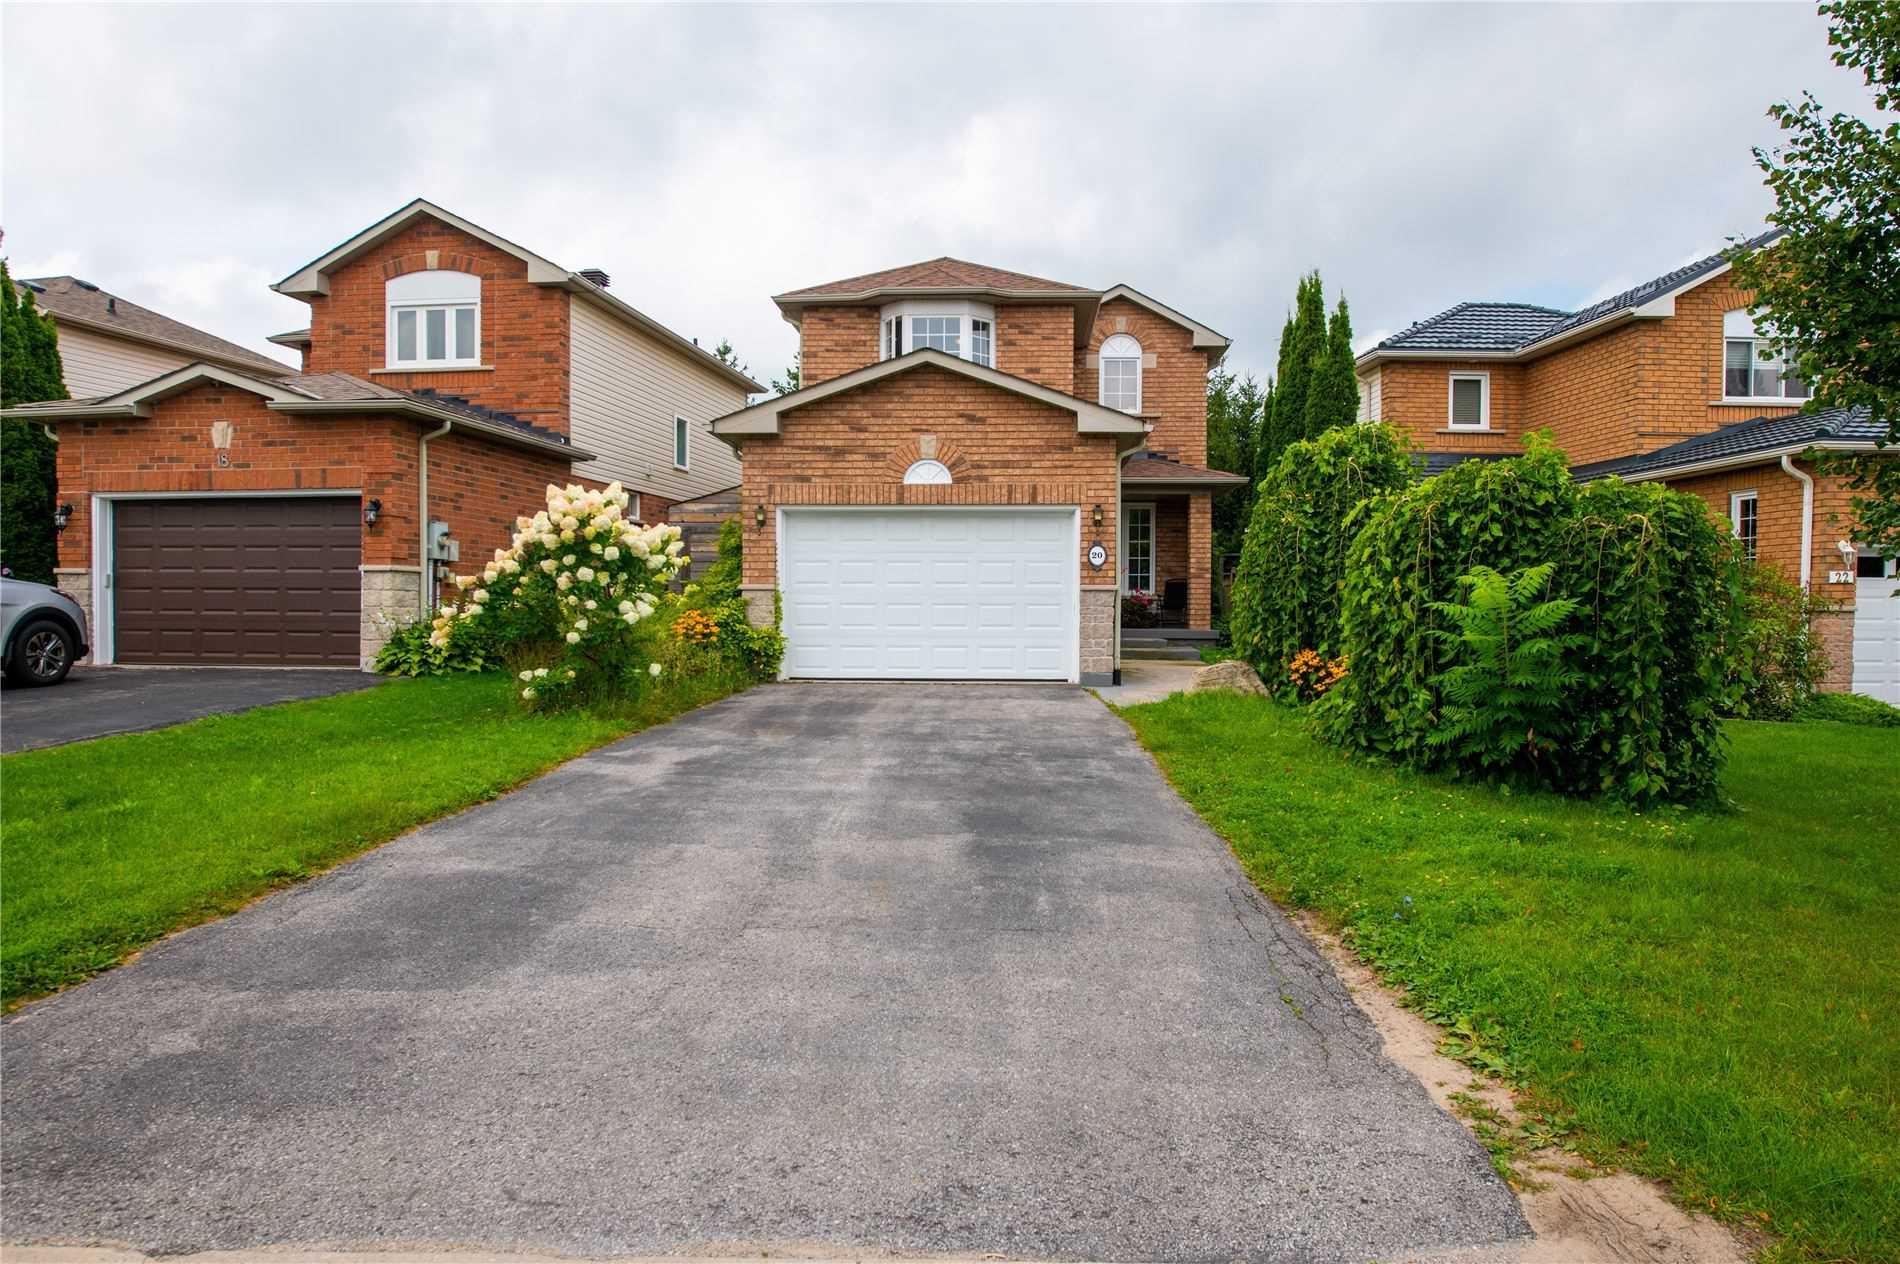 20 Bluegrass Dr, Barrie, Ontario L4N9N9, 3 Bedrooms Bedrooms, 6 Rooms Rooms,2 BathroomsBathrooms,Detached,For Sale,Bluegrass,S5354226